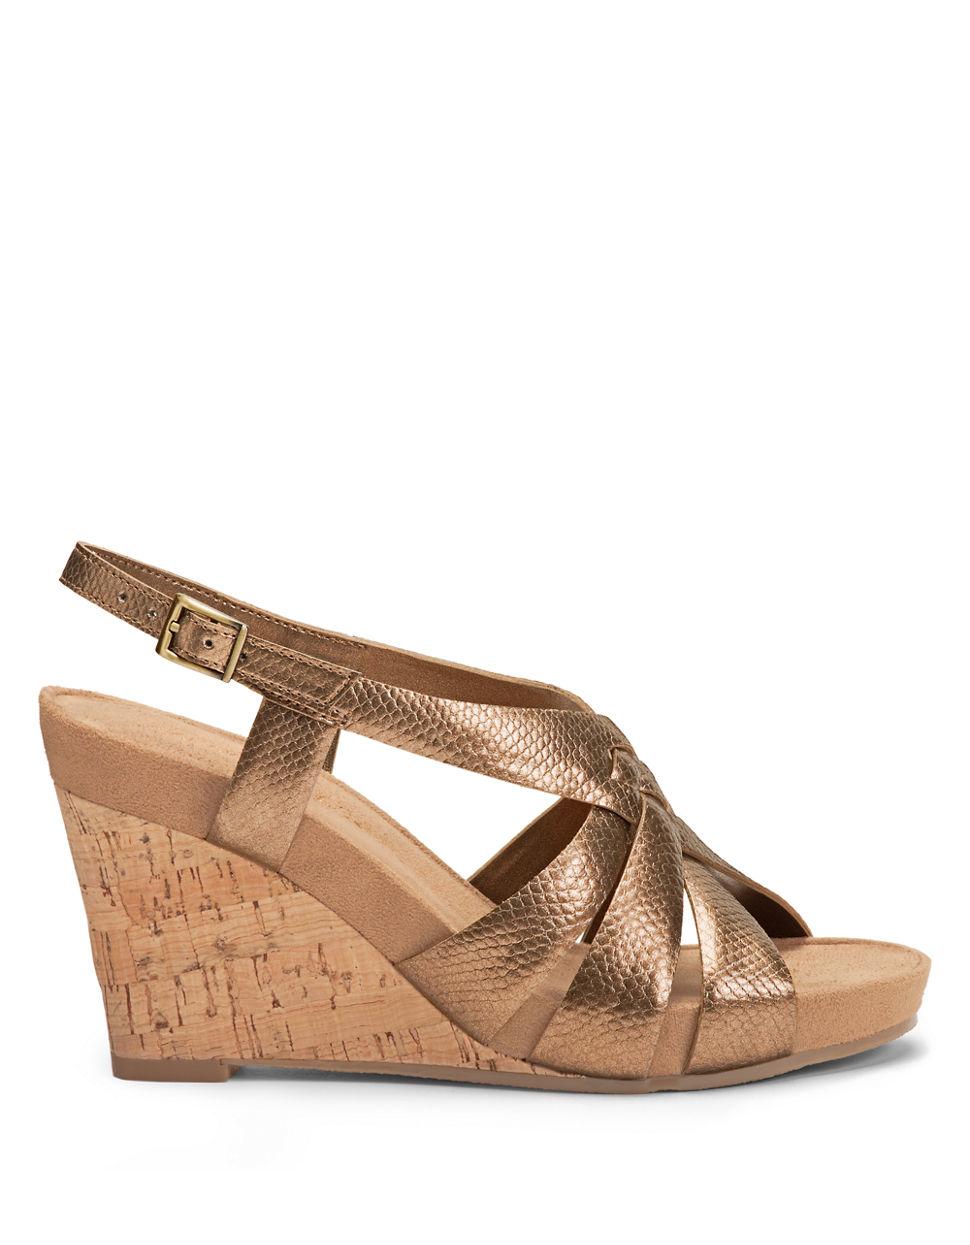 aerosoles guavaplush cork wedge sandals in gold bronze